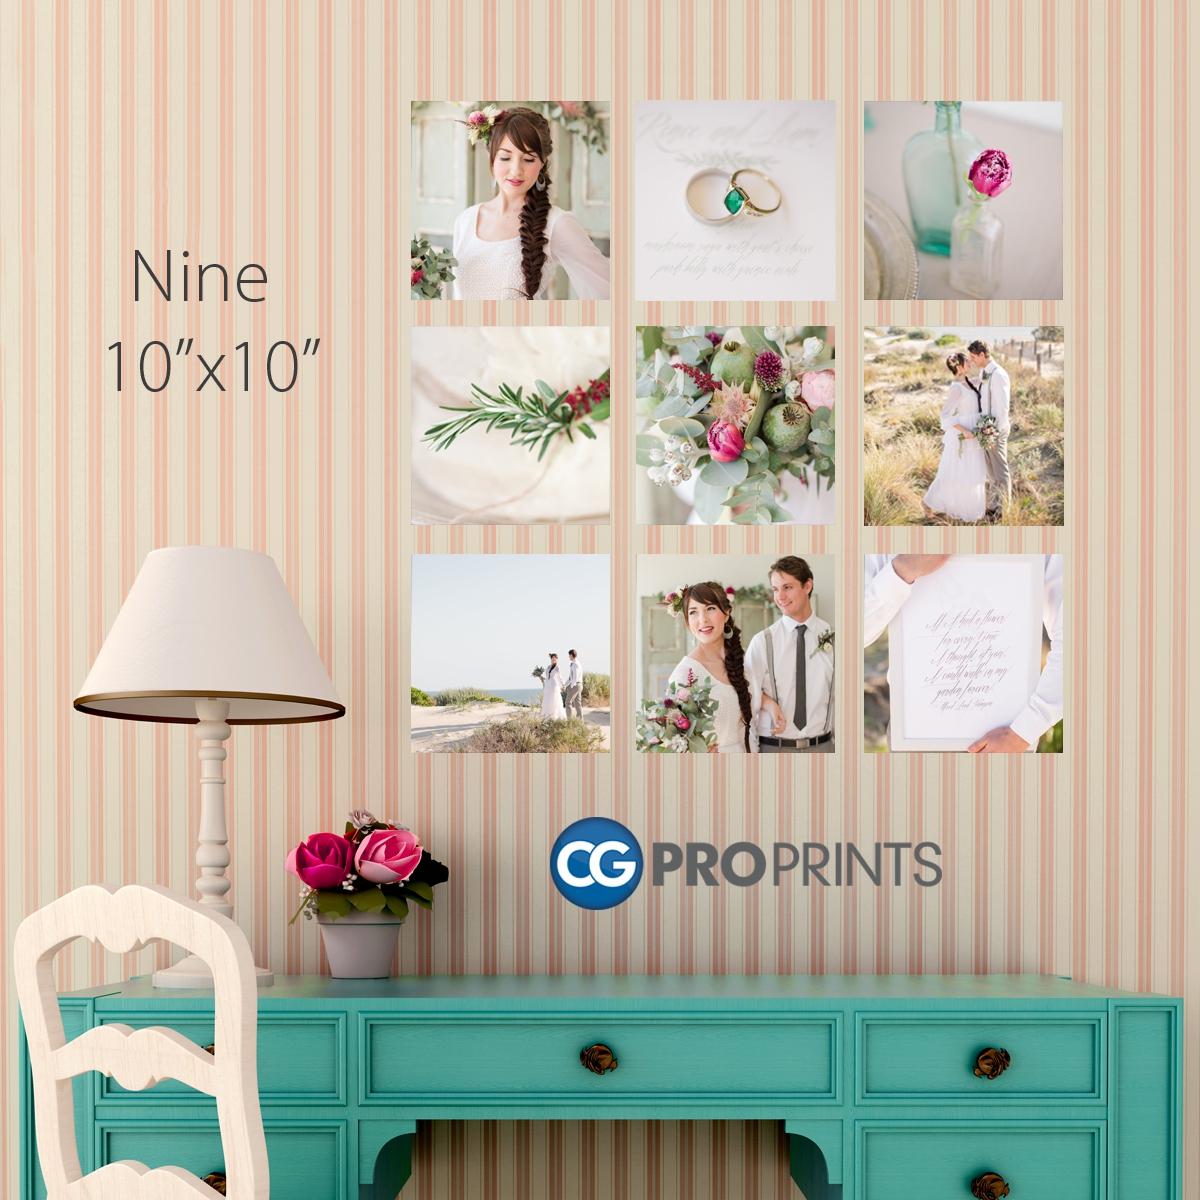 cgpro prints giveaway_1579